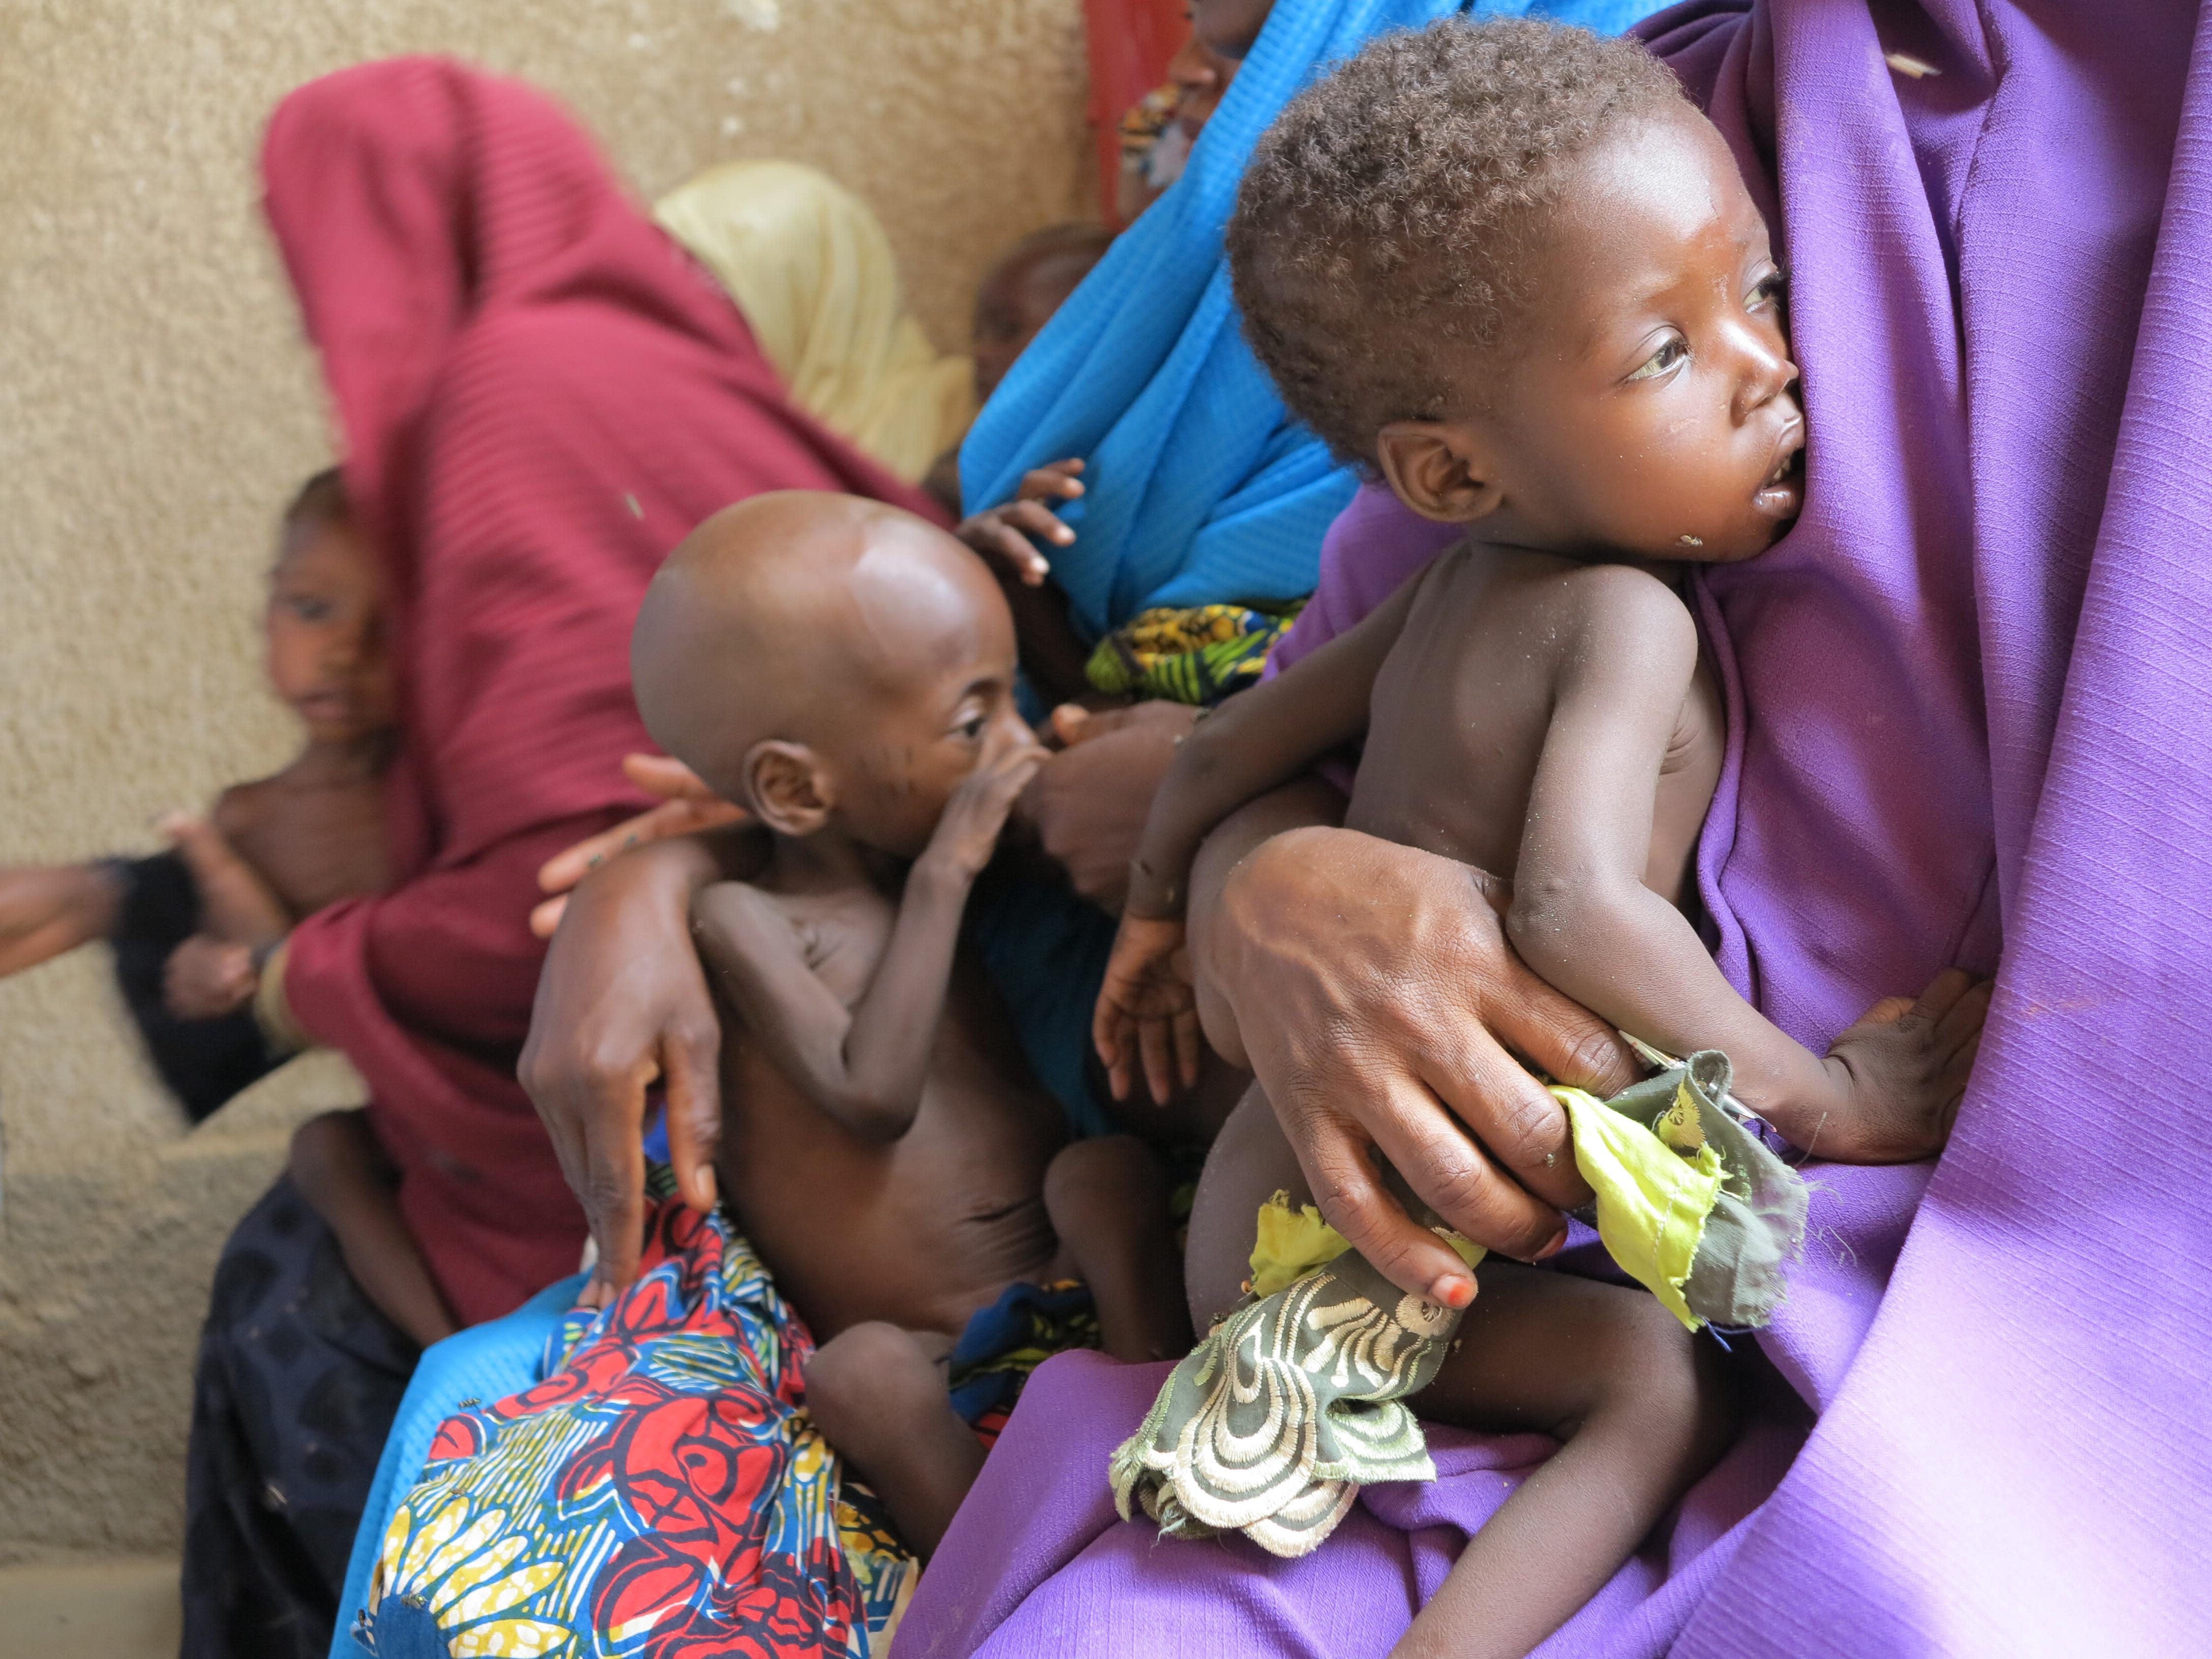 Boko Haram Has Left 250,000 Children Suffering from 'Severe Malnourishment'